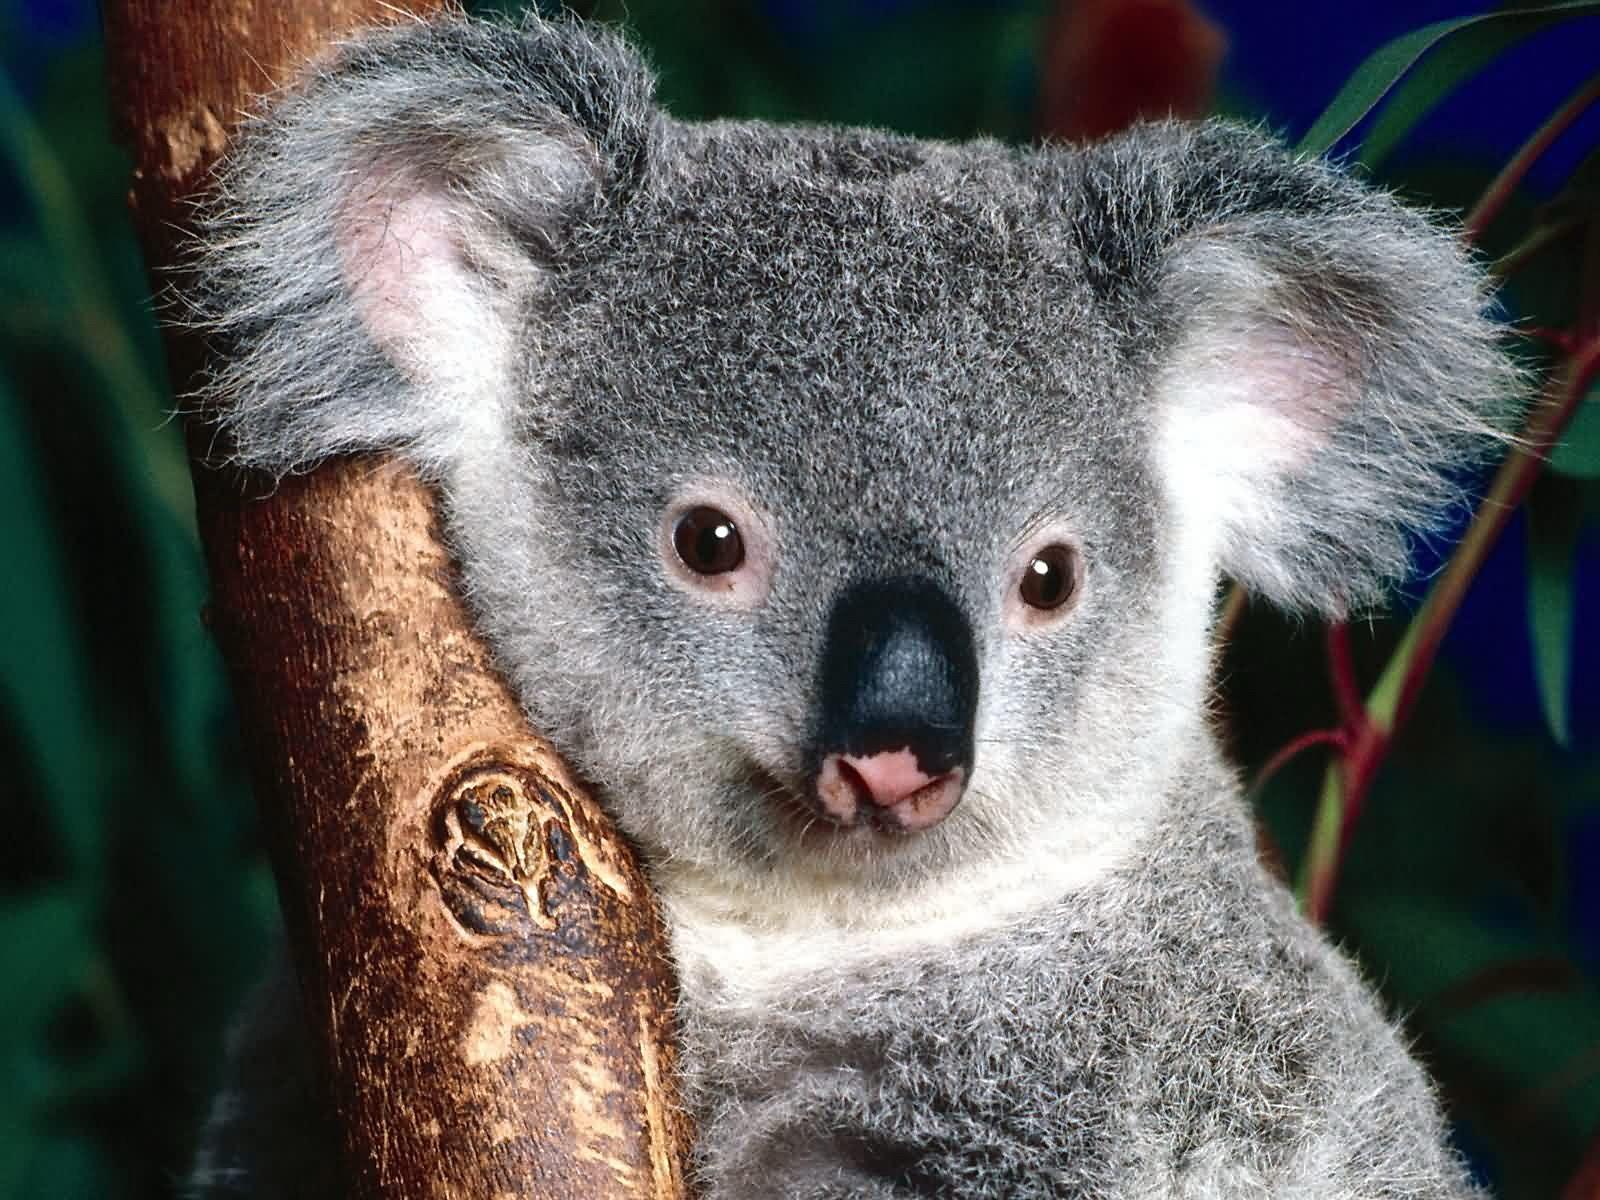 Australia Day Images Koala Hd Wallpaper And Background Photos 39226727